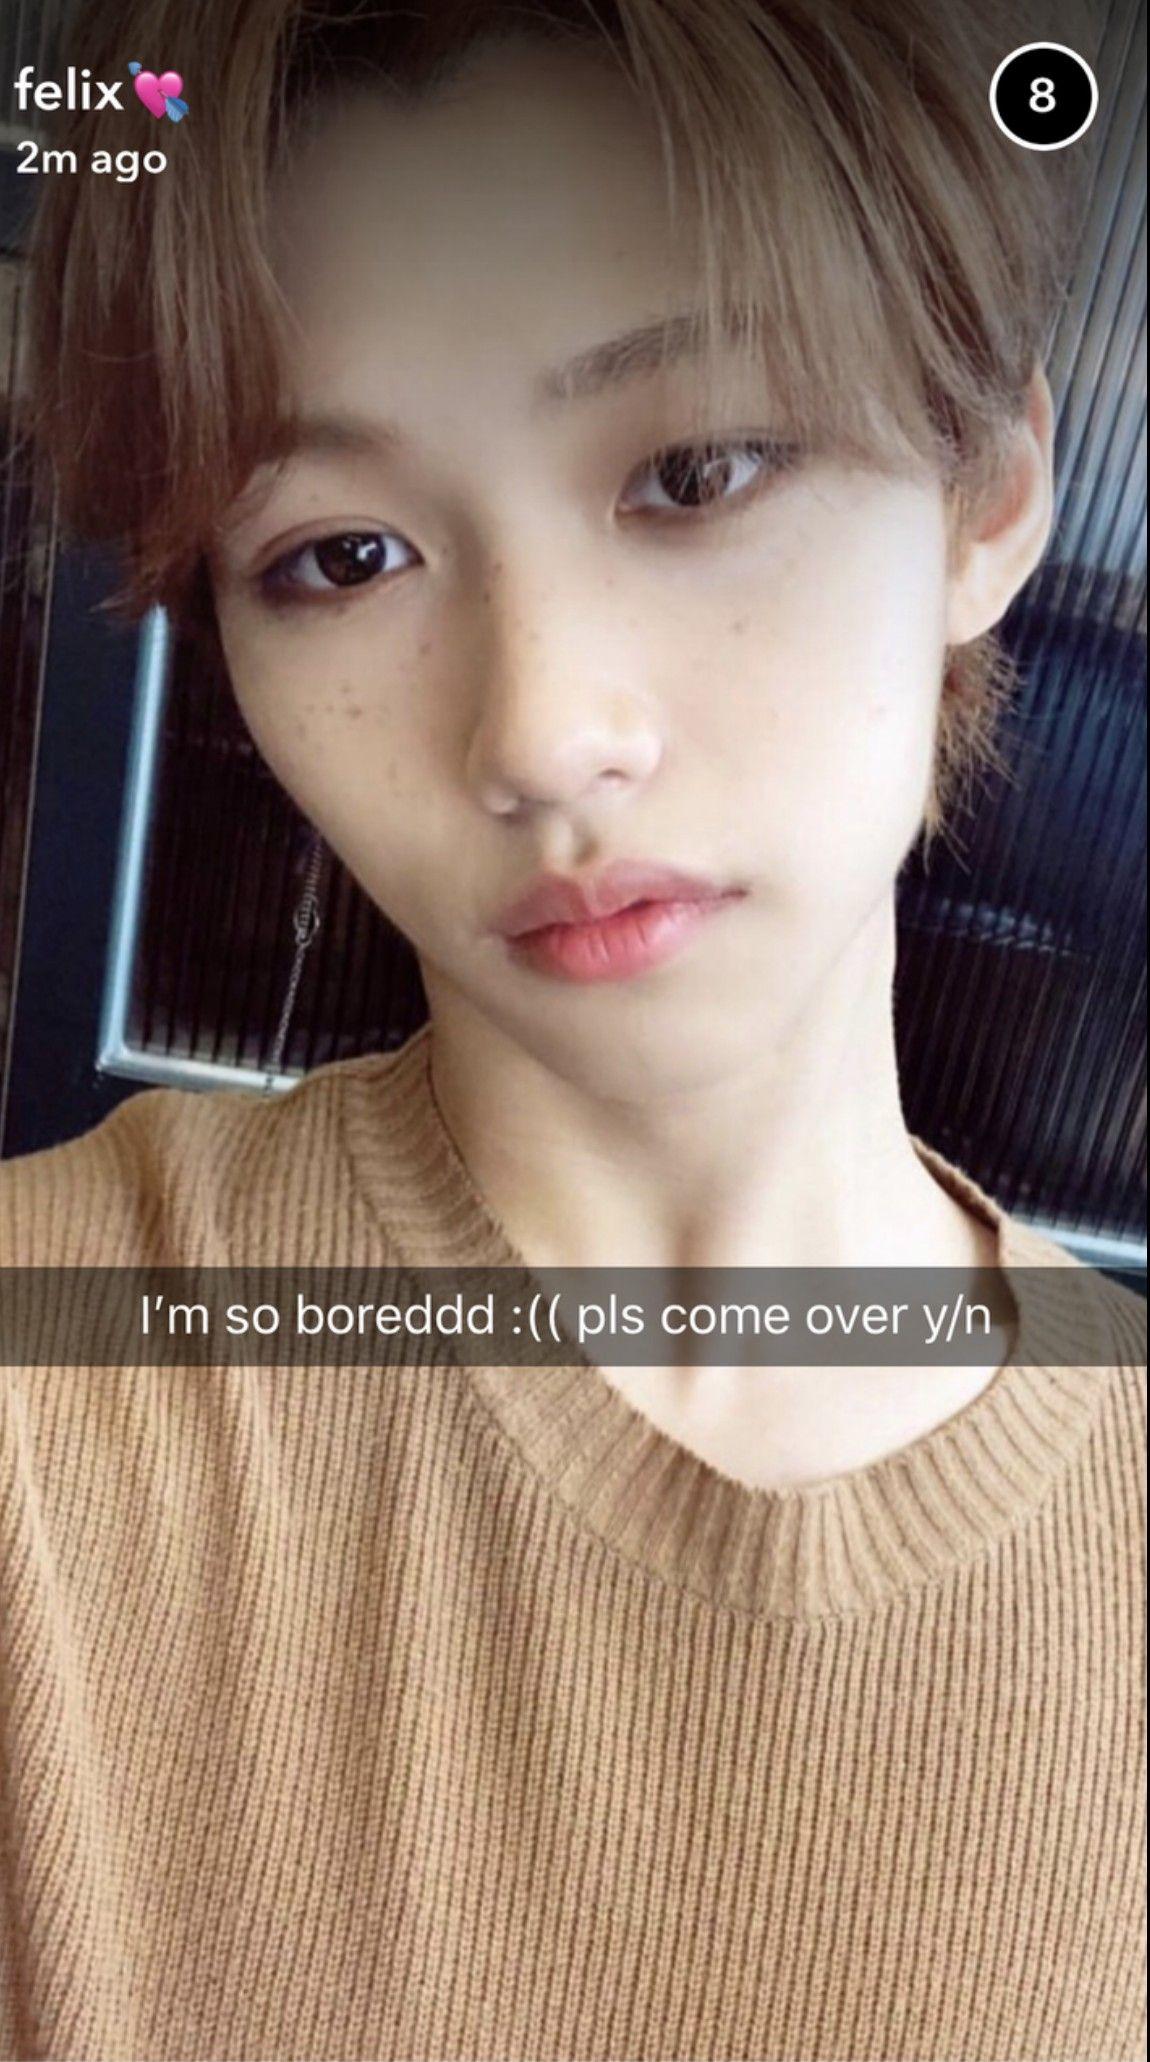 Lee Felix Boyfriend Snapchat Au Stray Kids Lee Felix Boyfriend Snapchat Kpop Felix Stray Kids Kids Snapchat Boyfriend Kpop